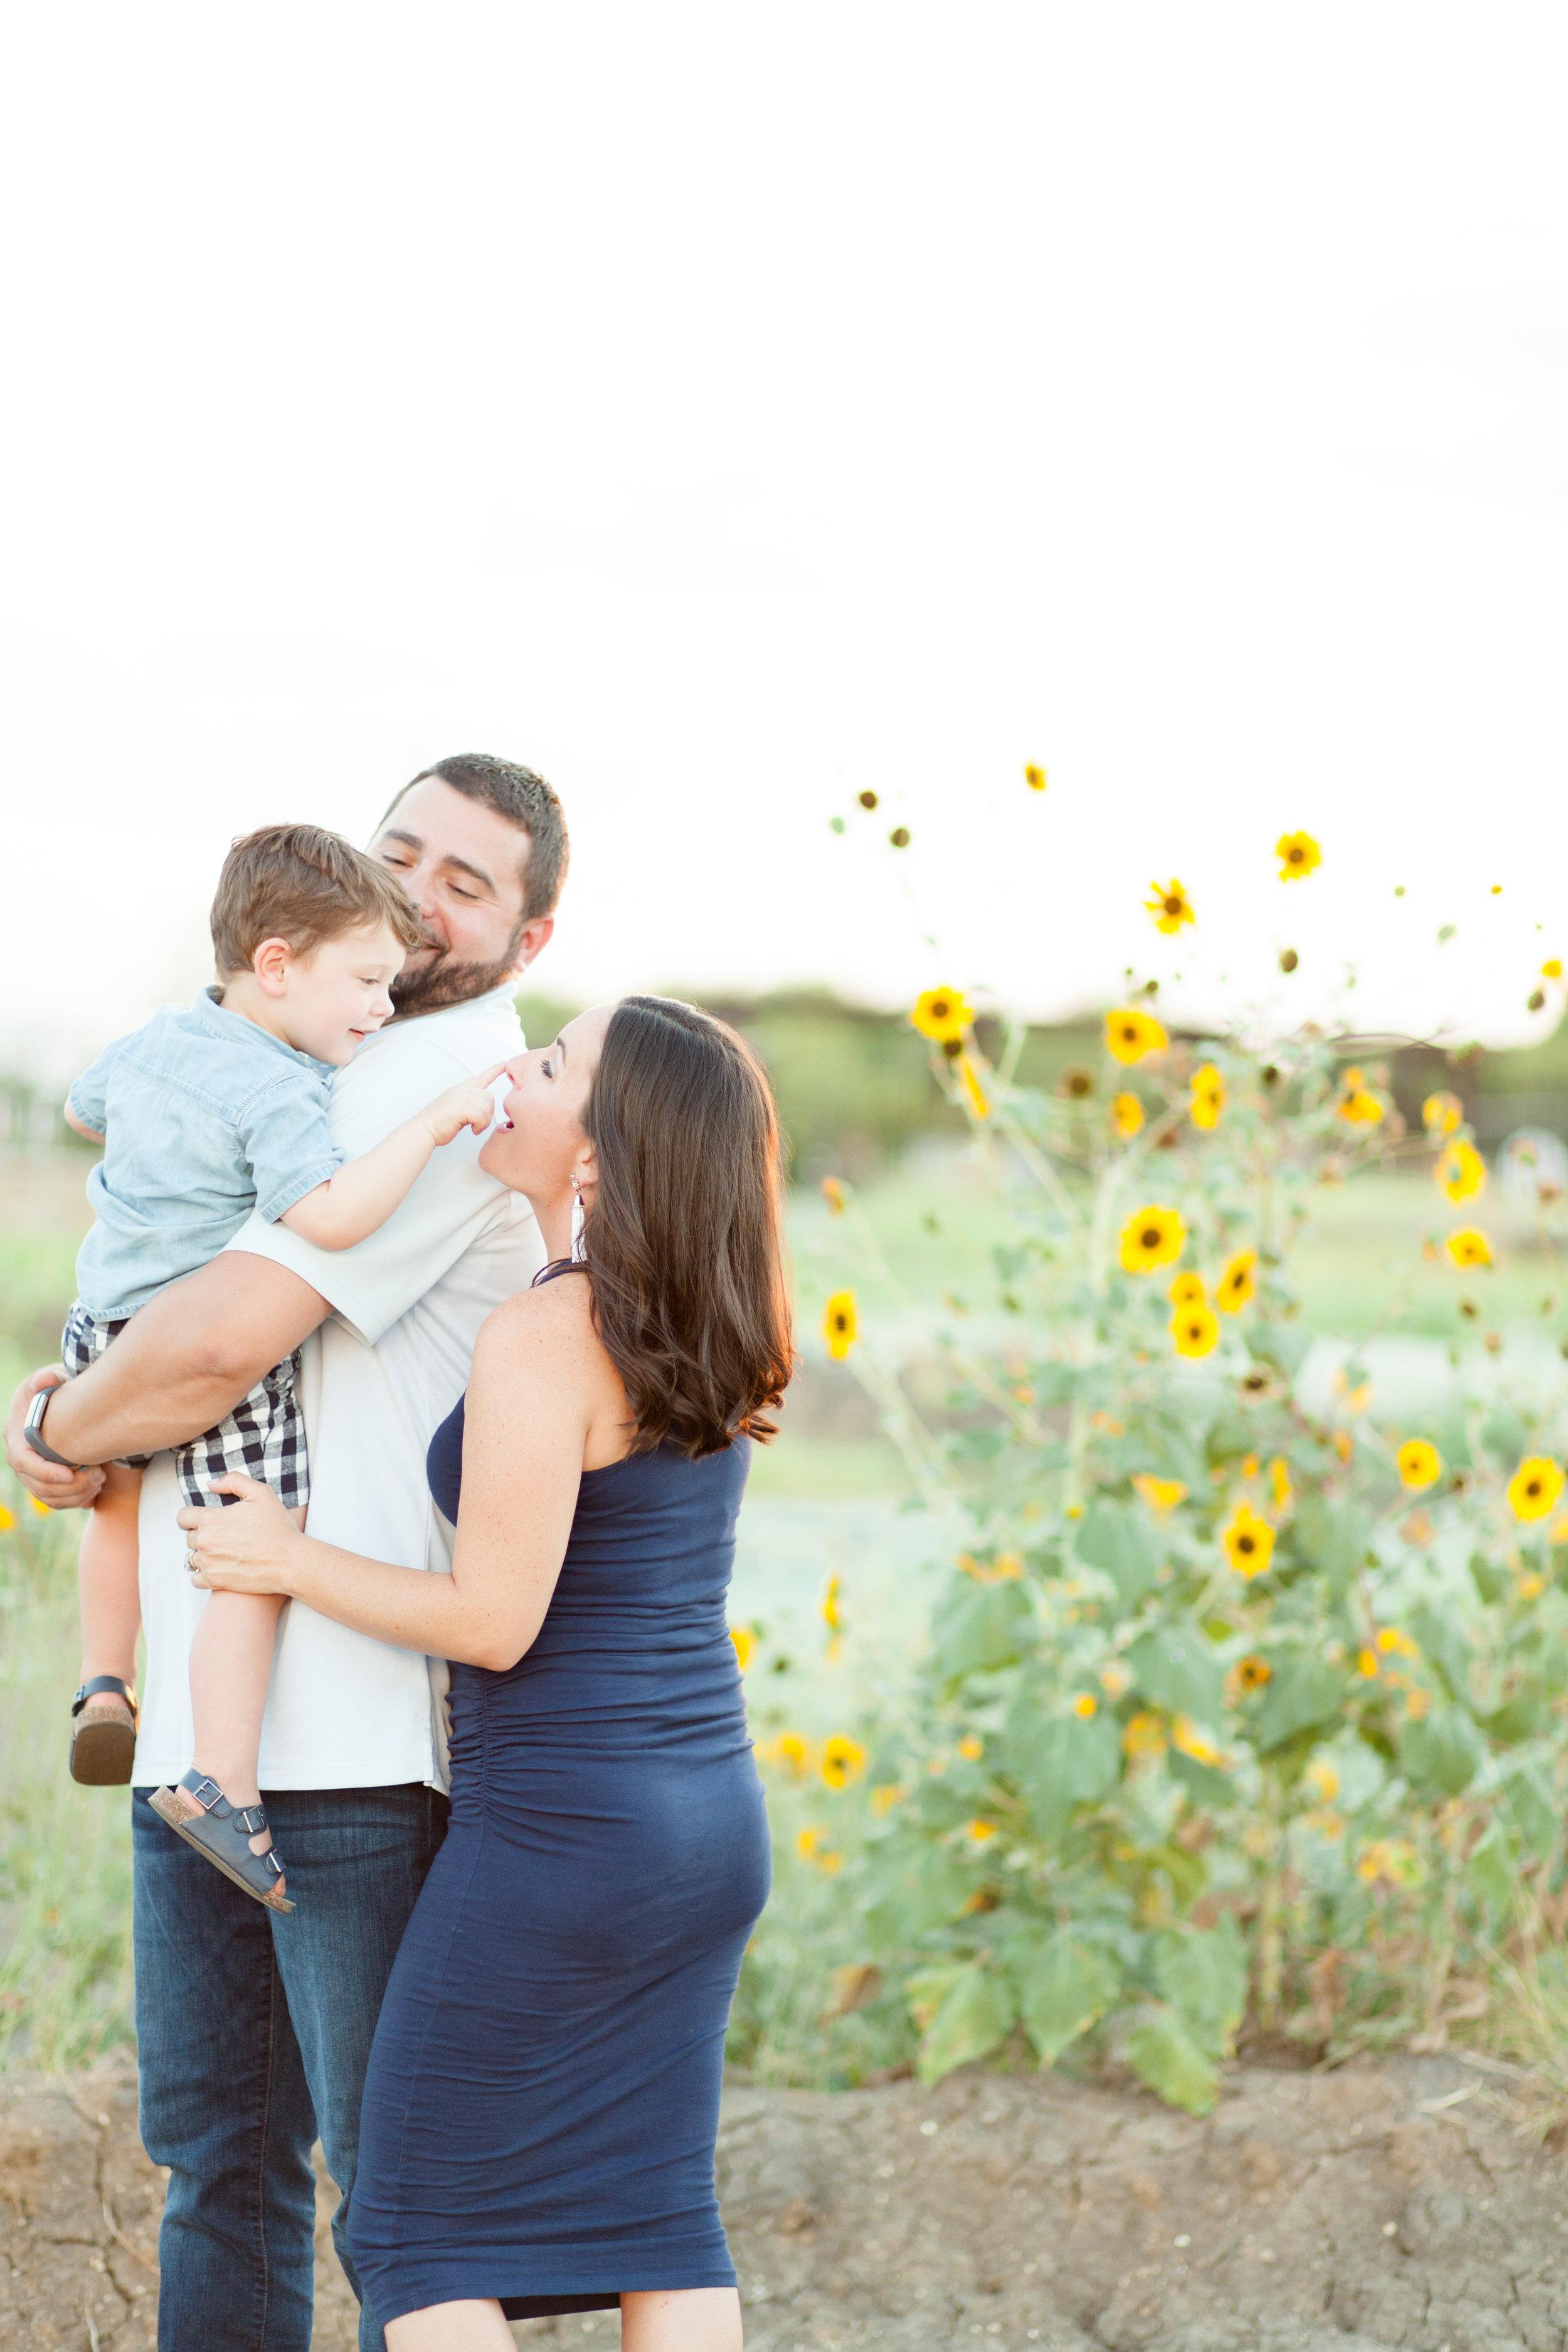 Copy of Non-camera aware family photo